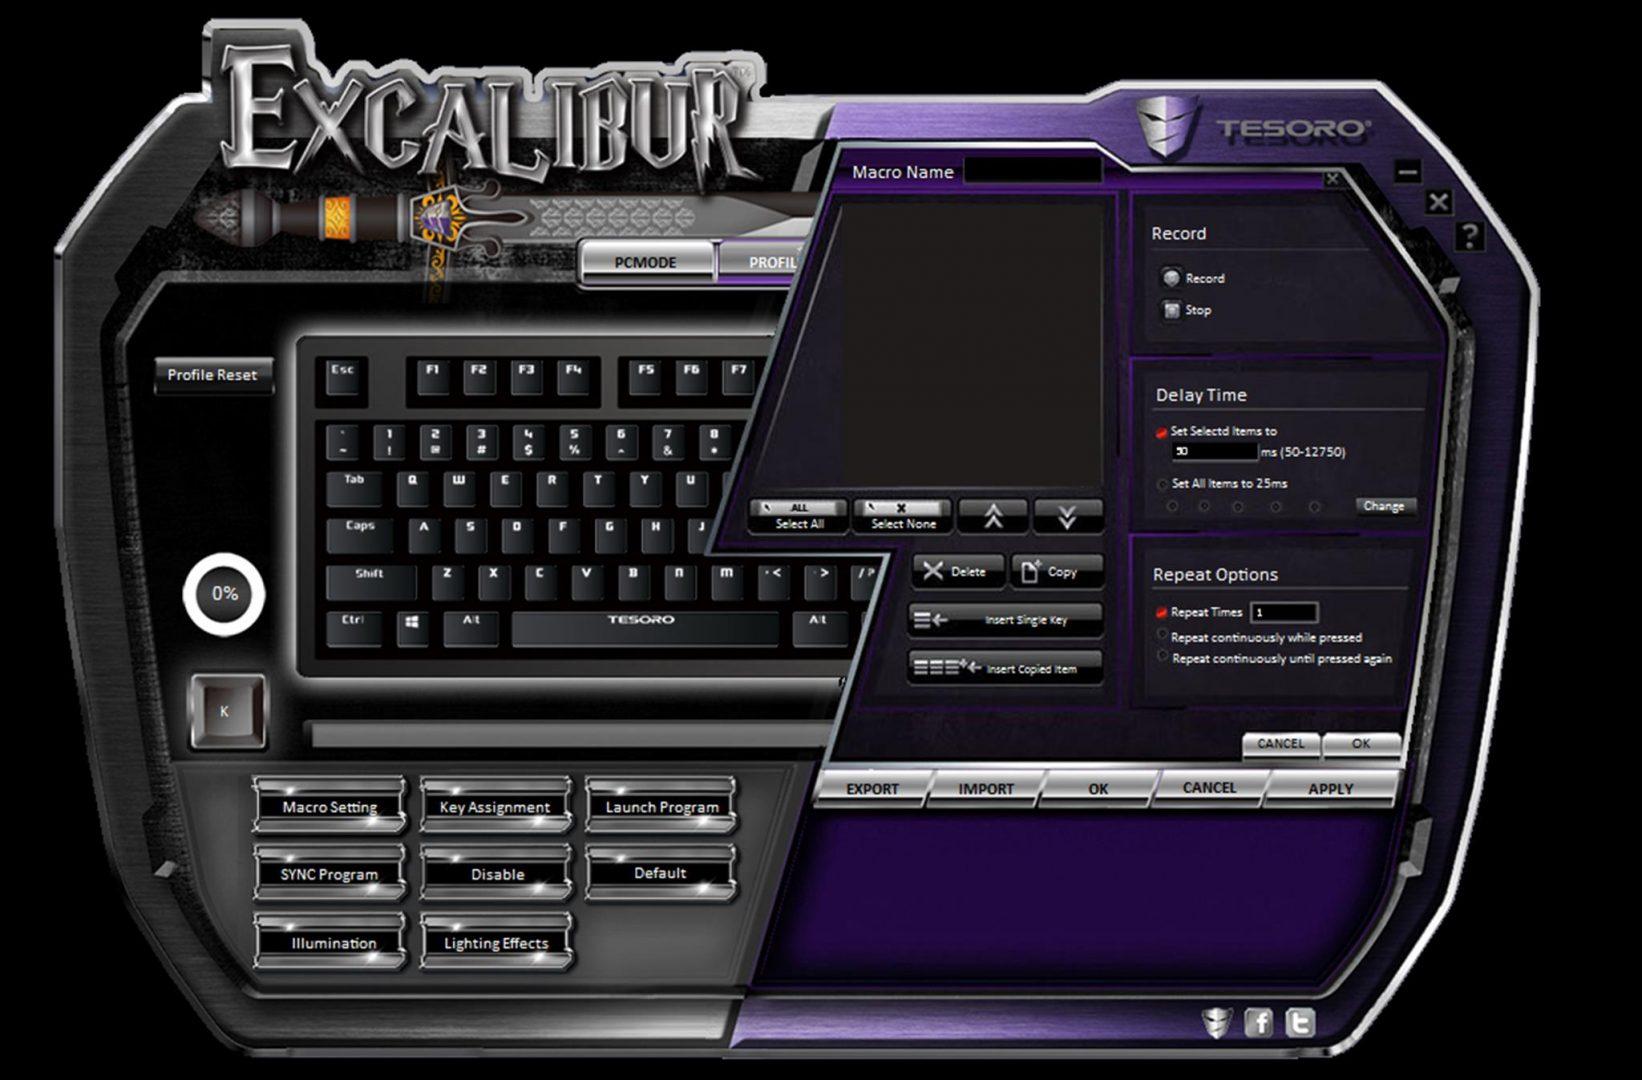 tesoro excalibur spectrum software 1